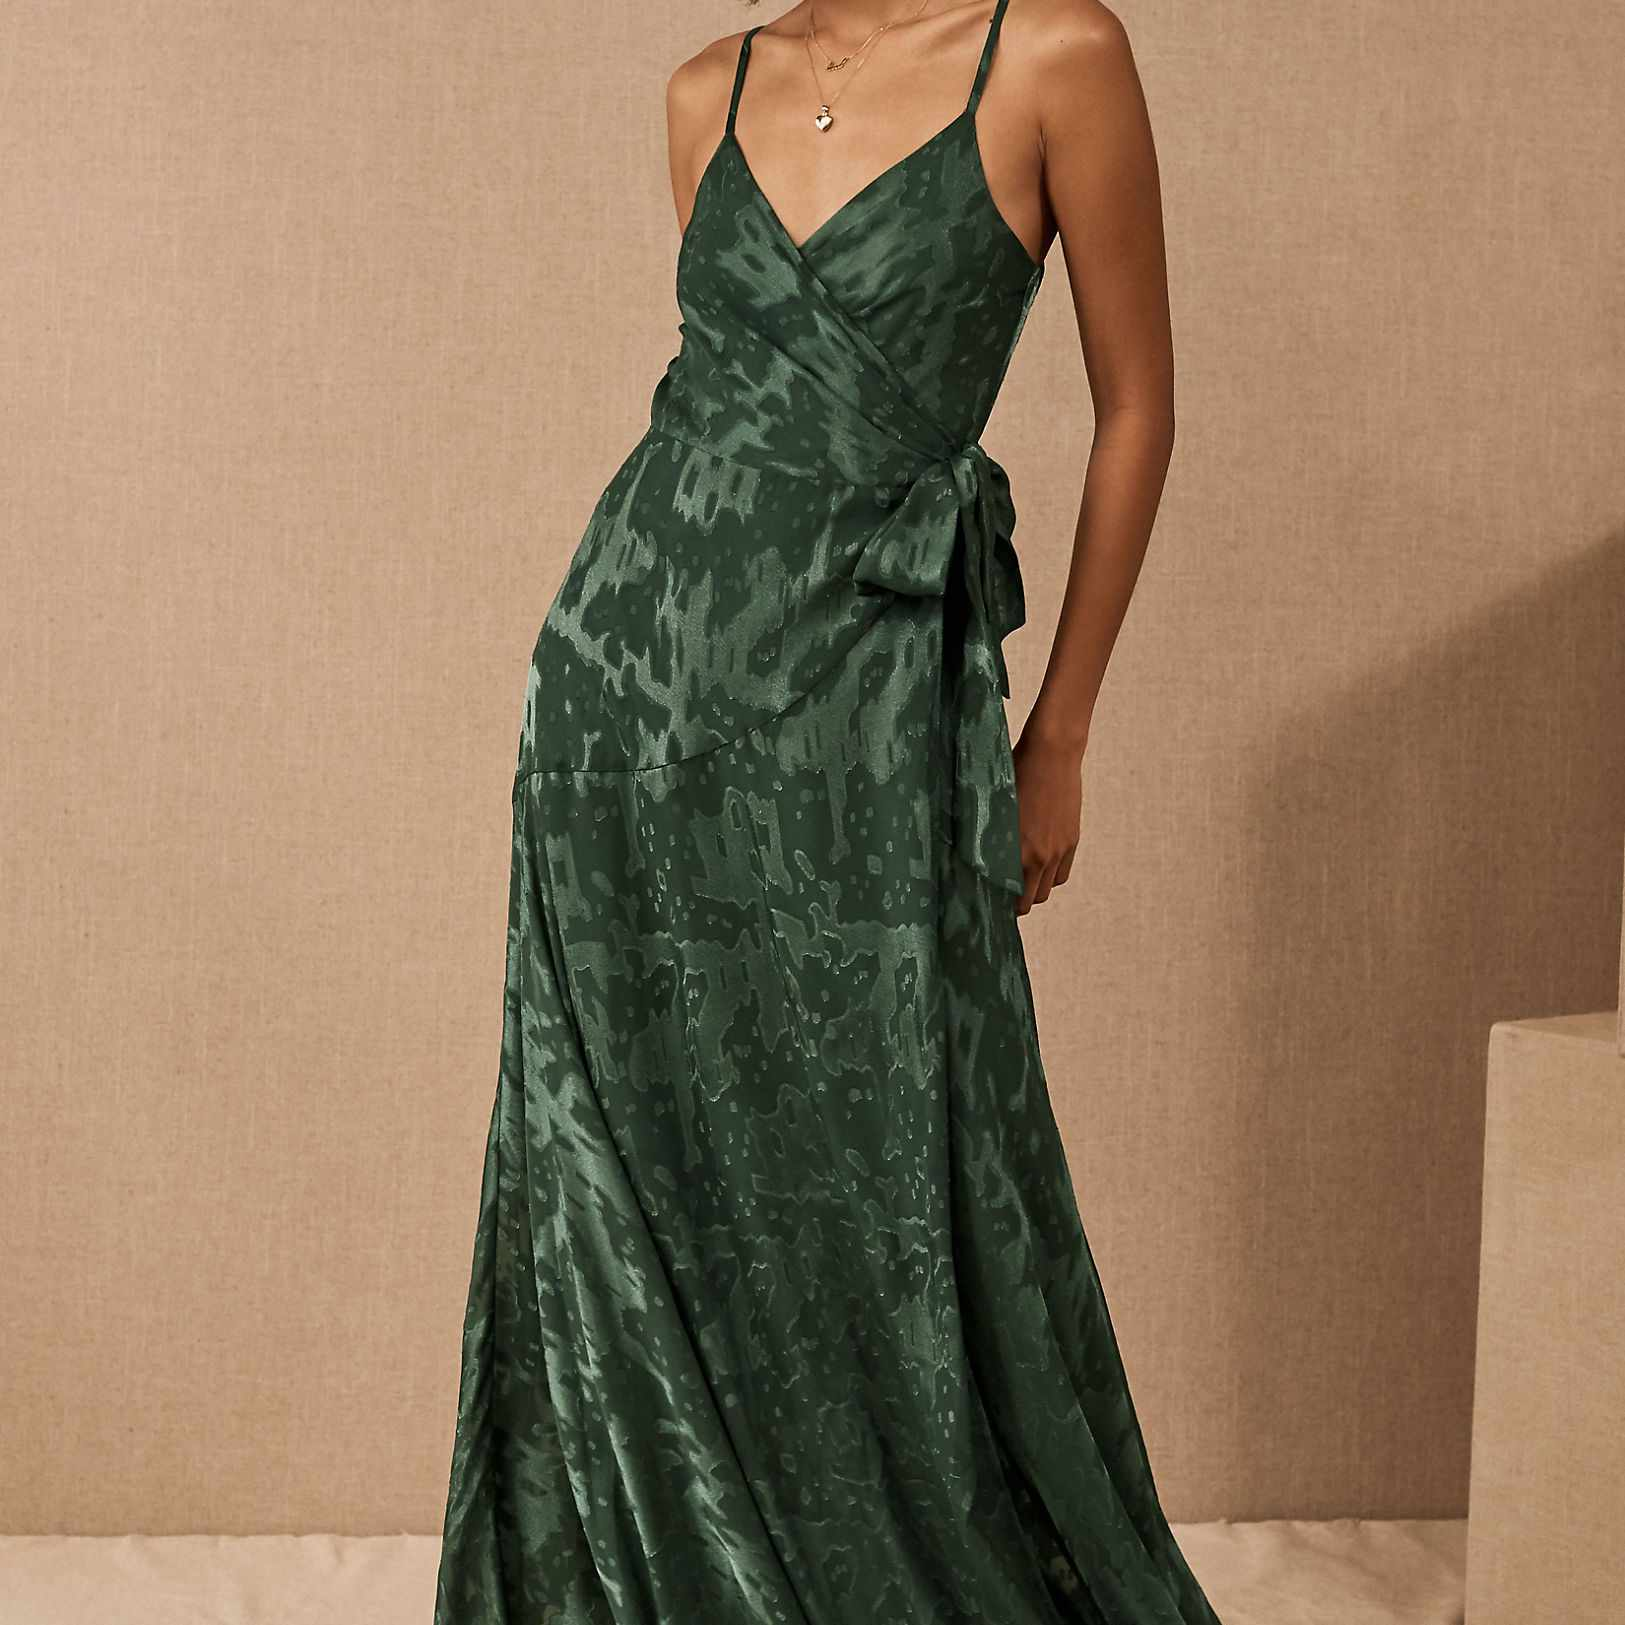 Hutch Alden Dress, $275